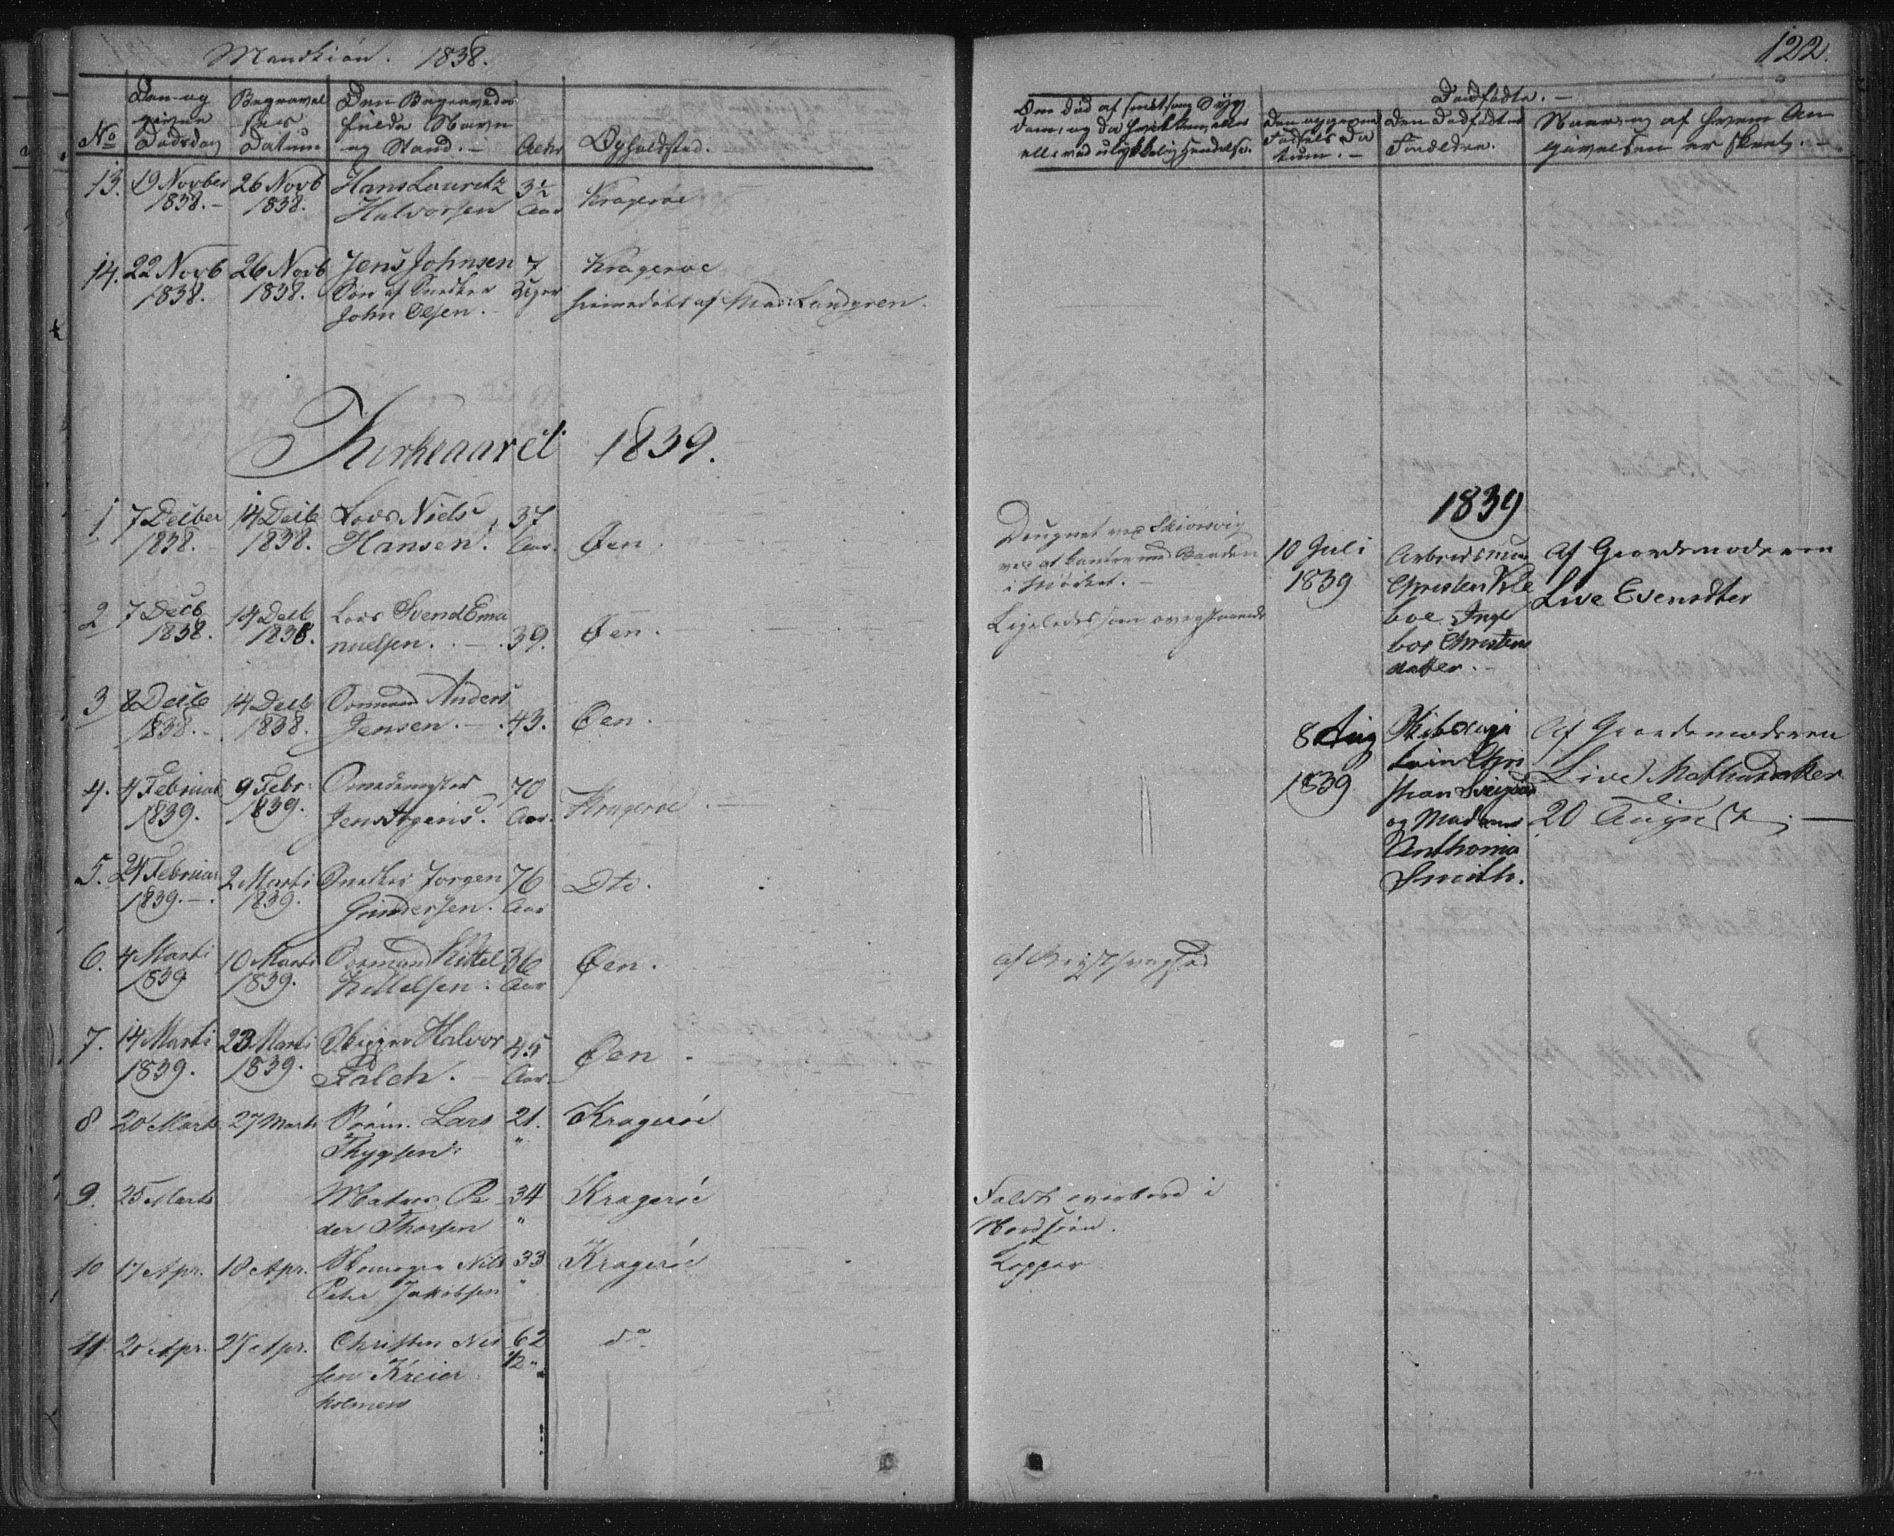 SAKO, Kragerø kirkebøker, F/Fa/L0005: Ministerialbok nr. 5, 1832-1847, s. 122